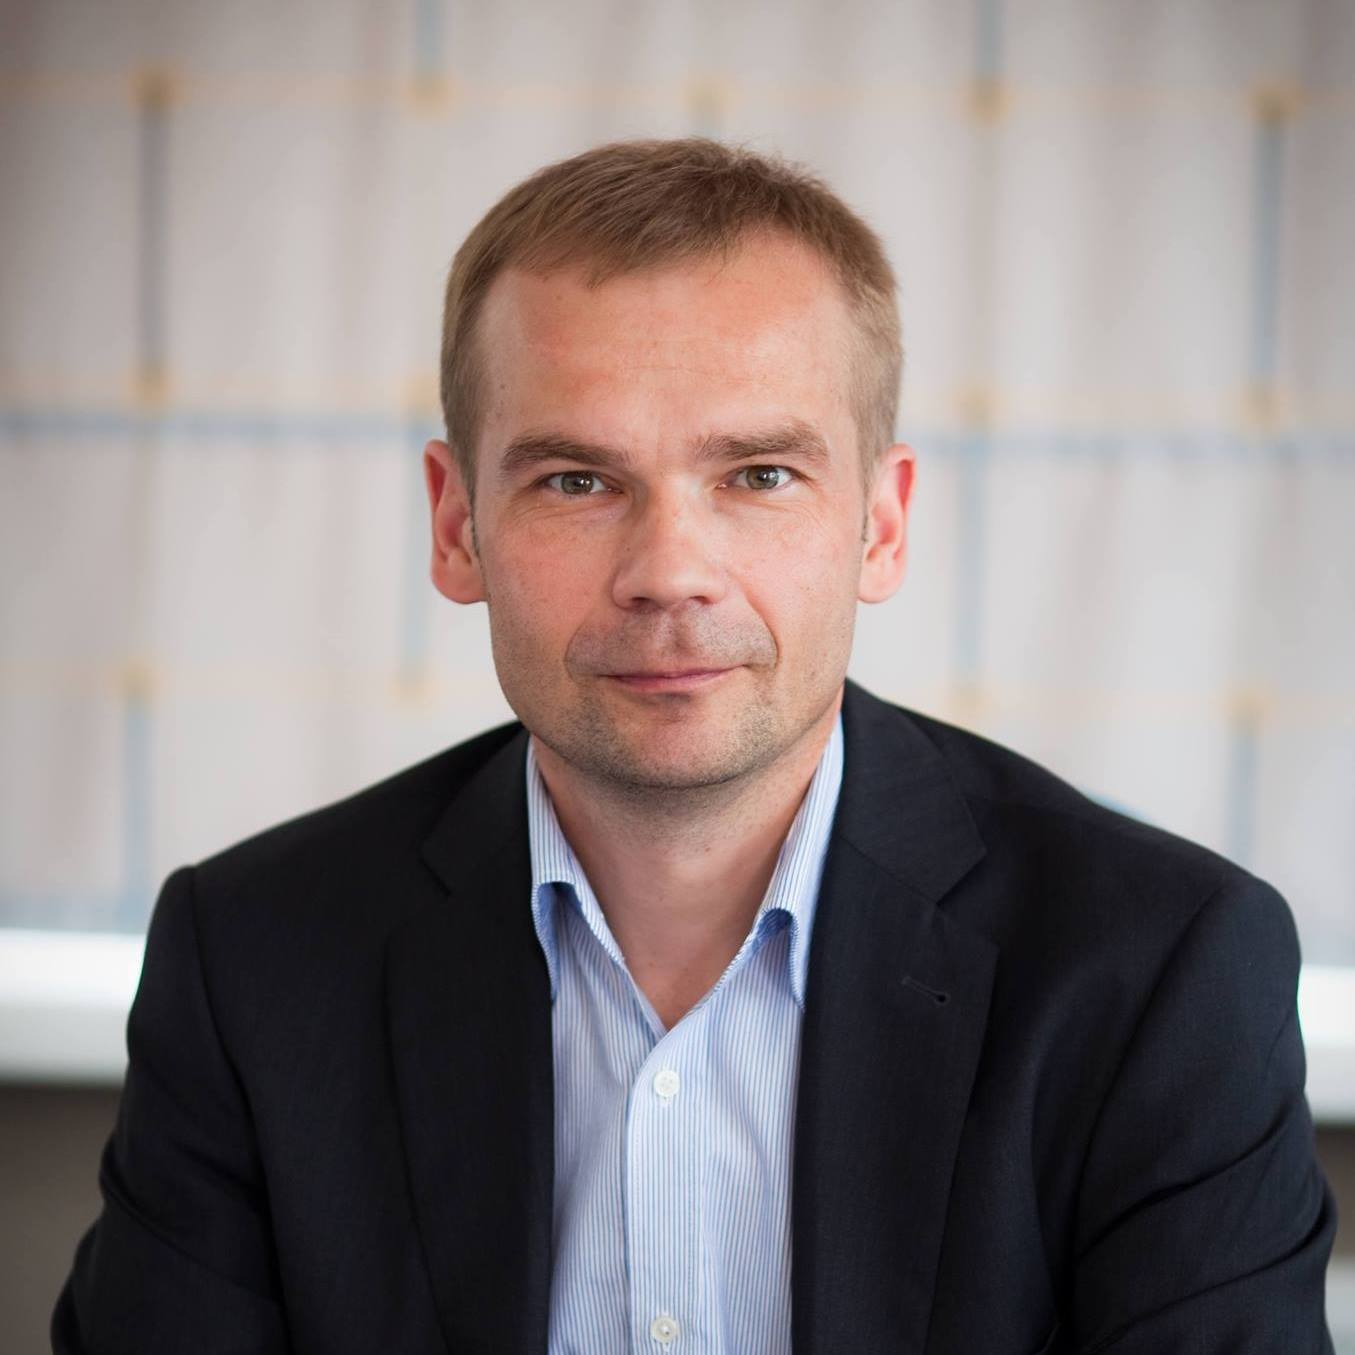 Вадим Рыбачук: Вакцинация в нынешних условиях необходима